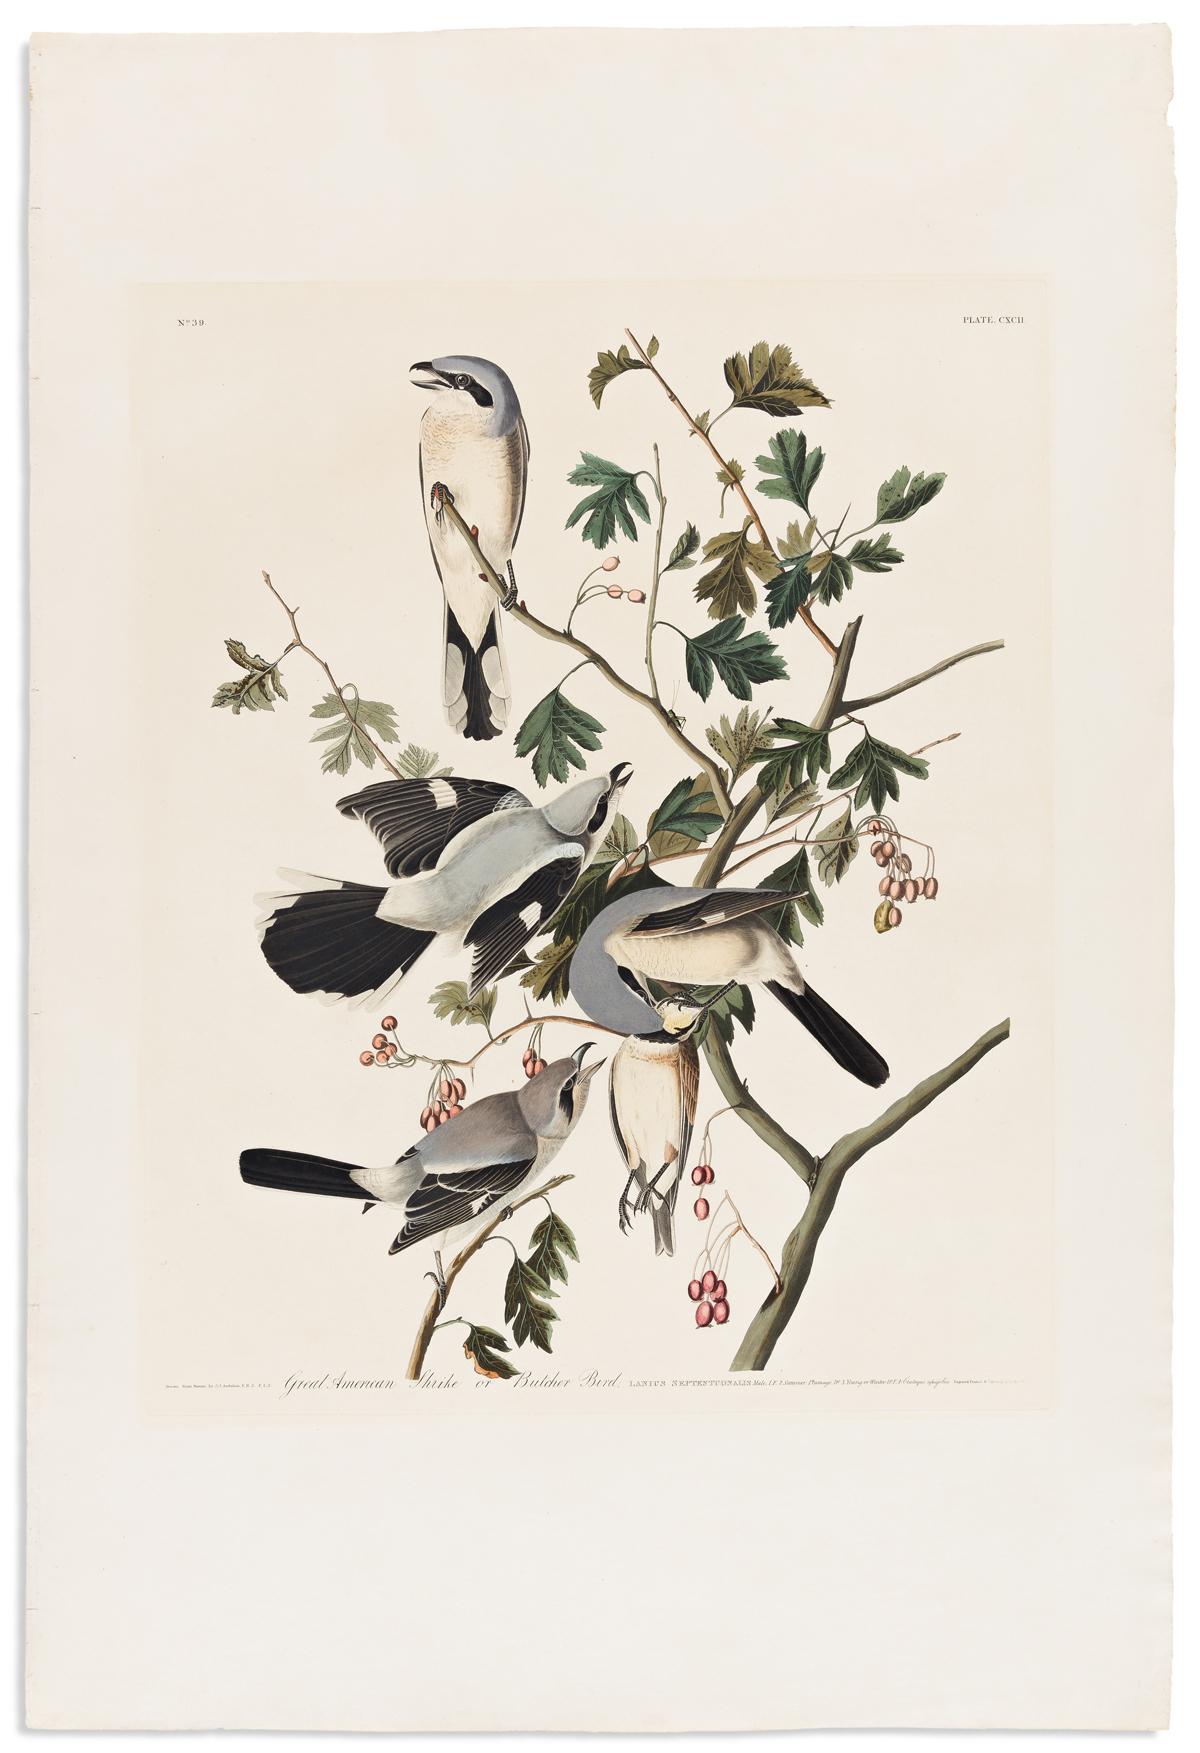 AUDUBON, JOHN JAMES. Great American Shrike or Butcher Bird. Plate CXCII.